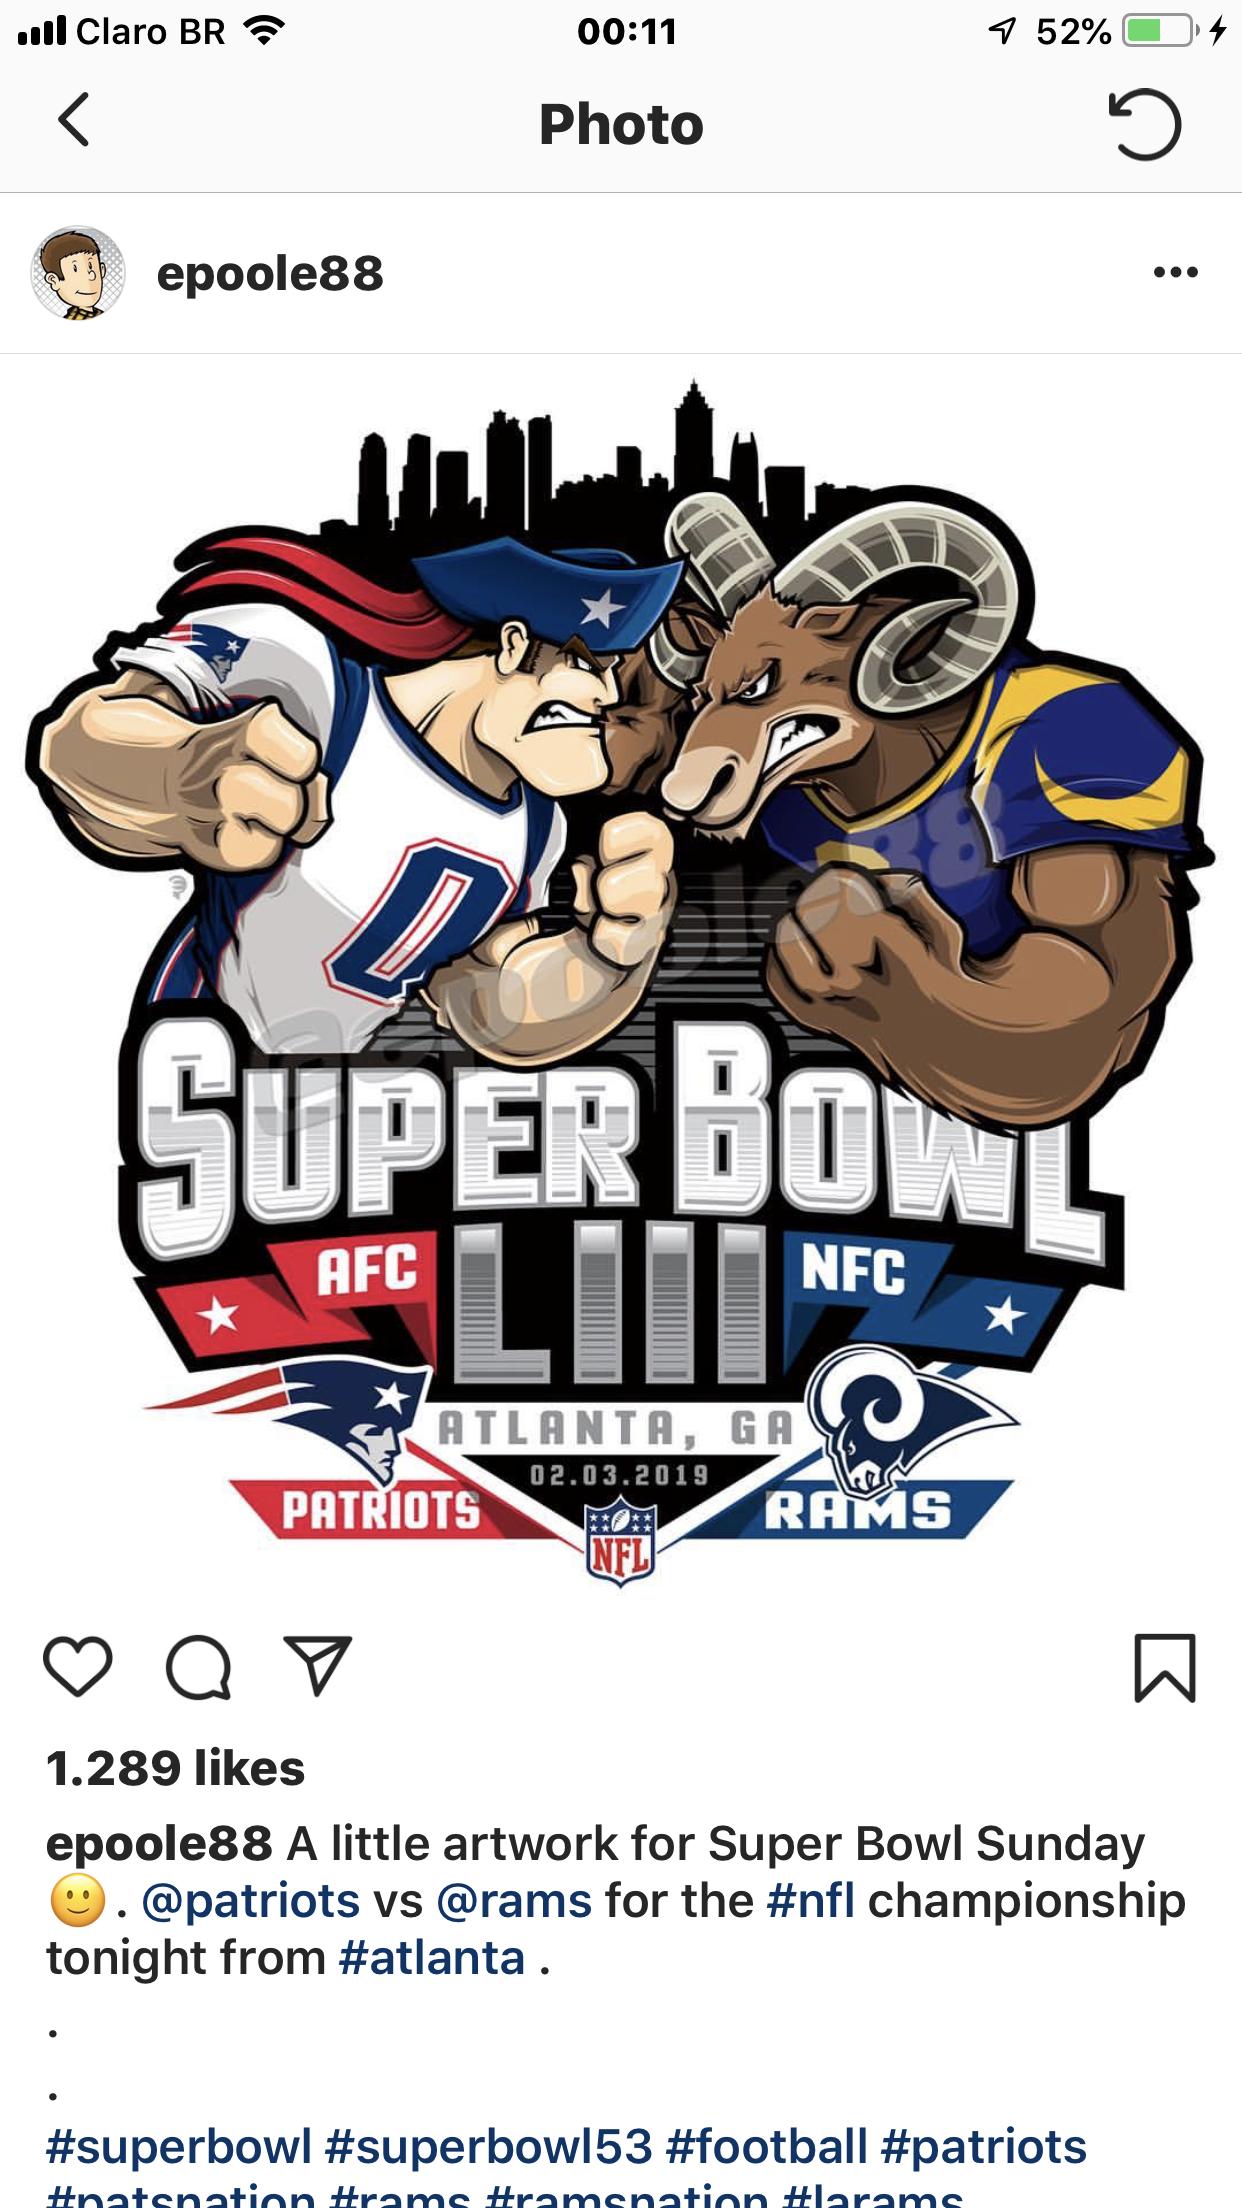 Pin By Maxsouza On Nfl 2019 New England Patriots New England Patriots Football Patriots Football